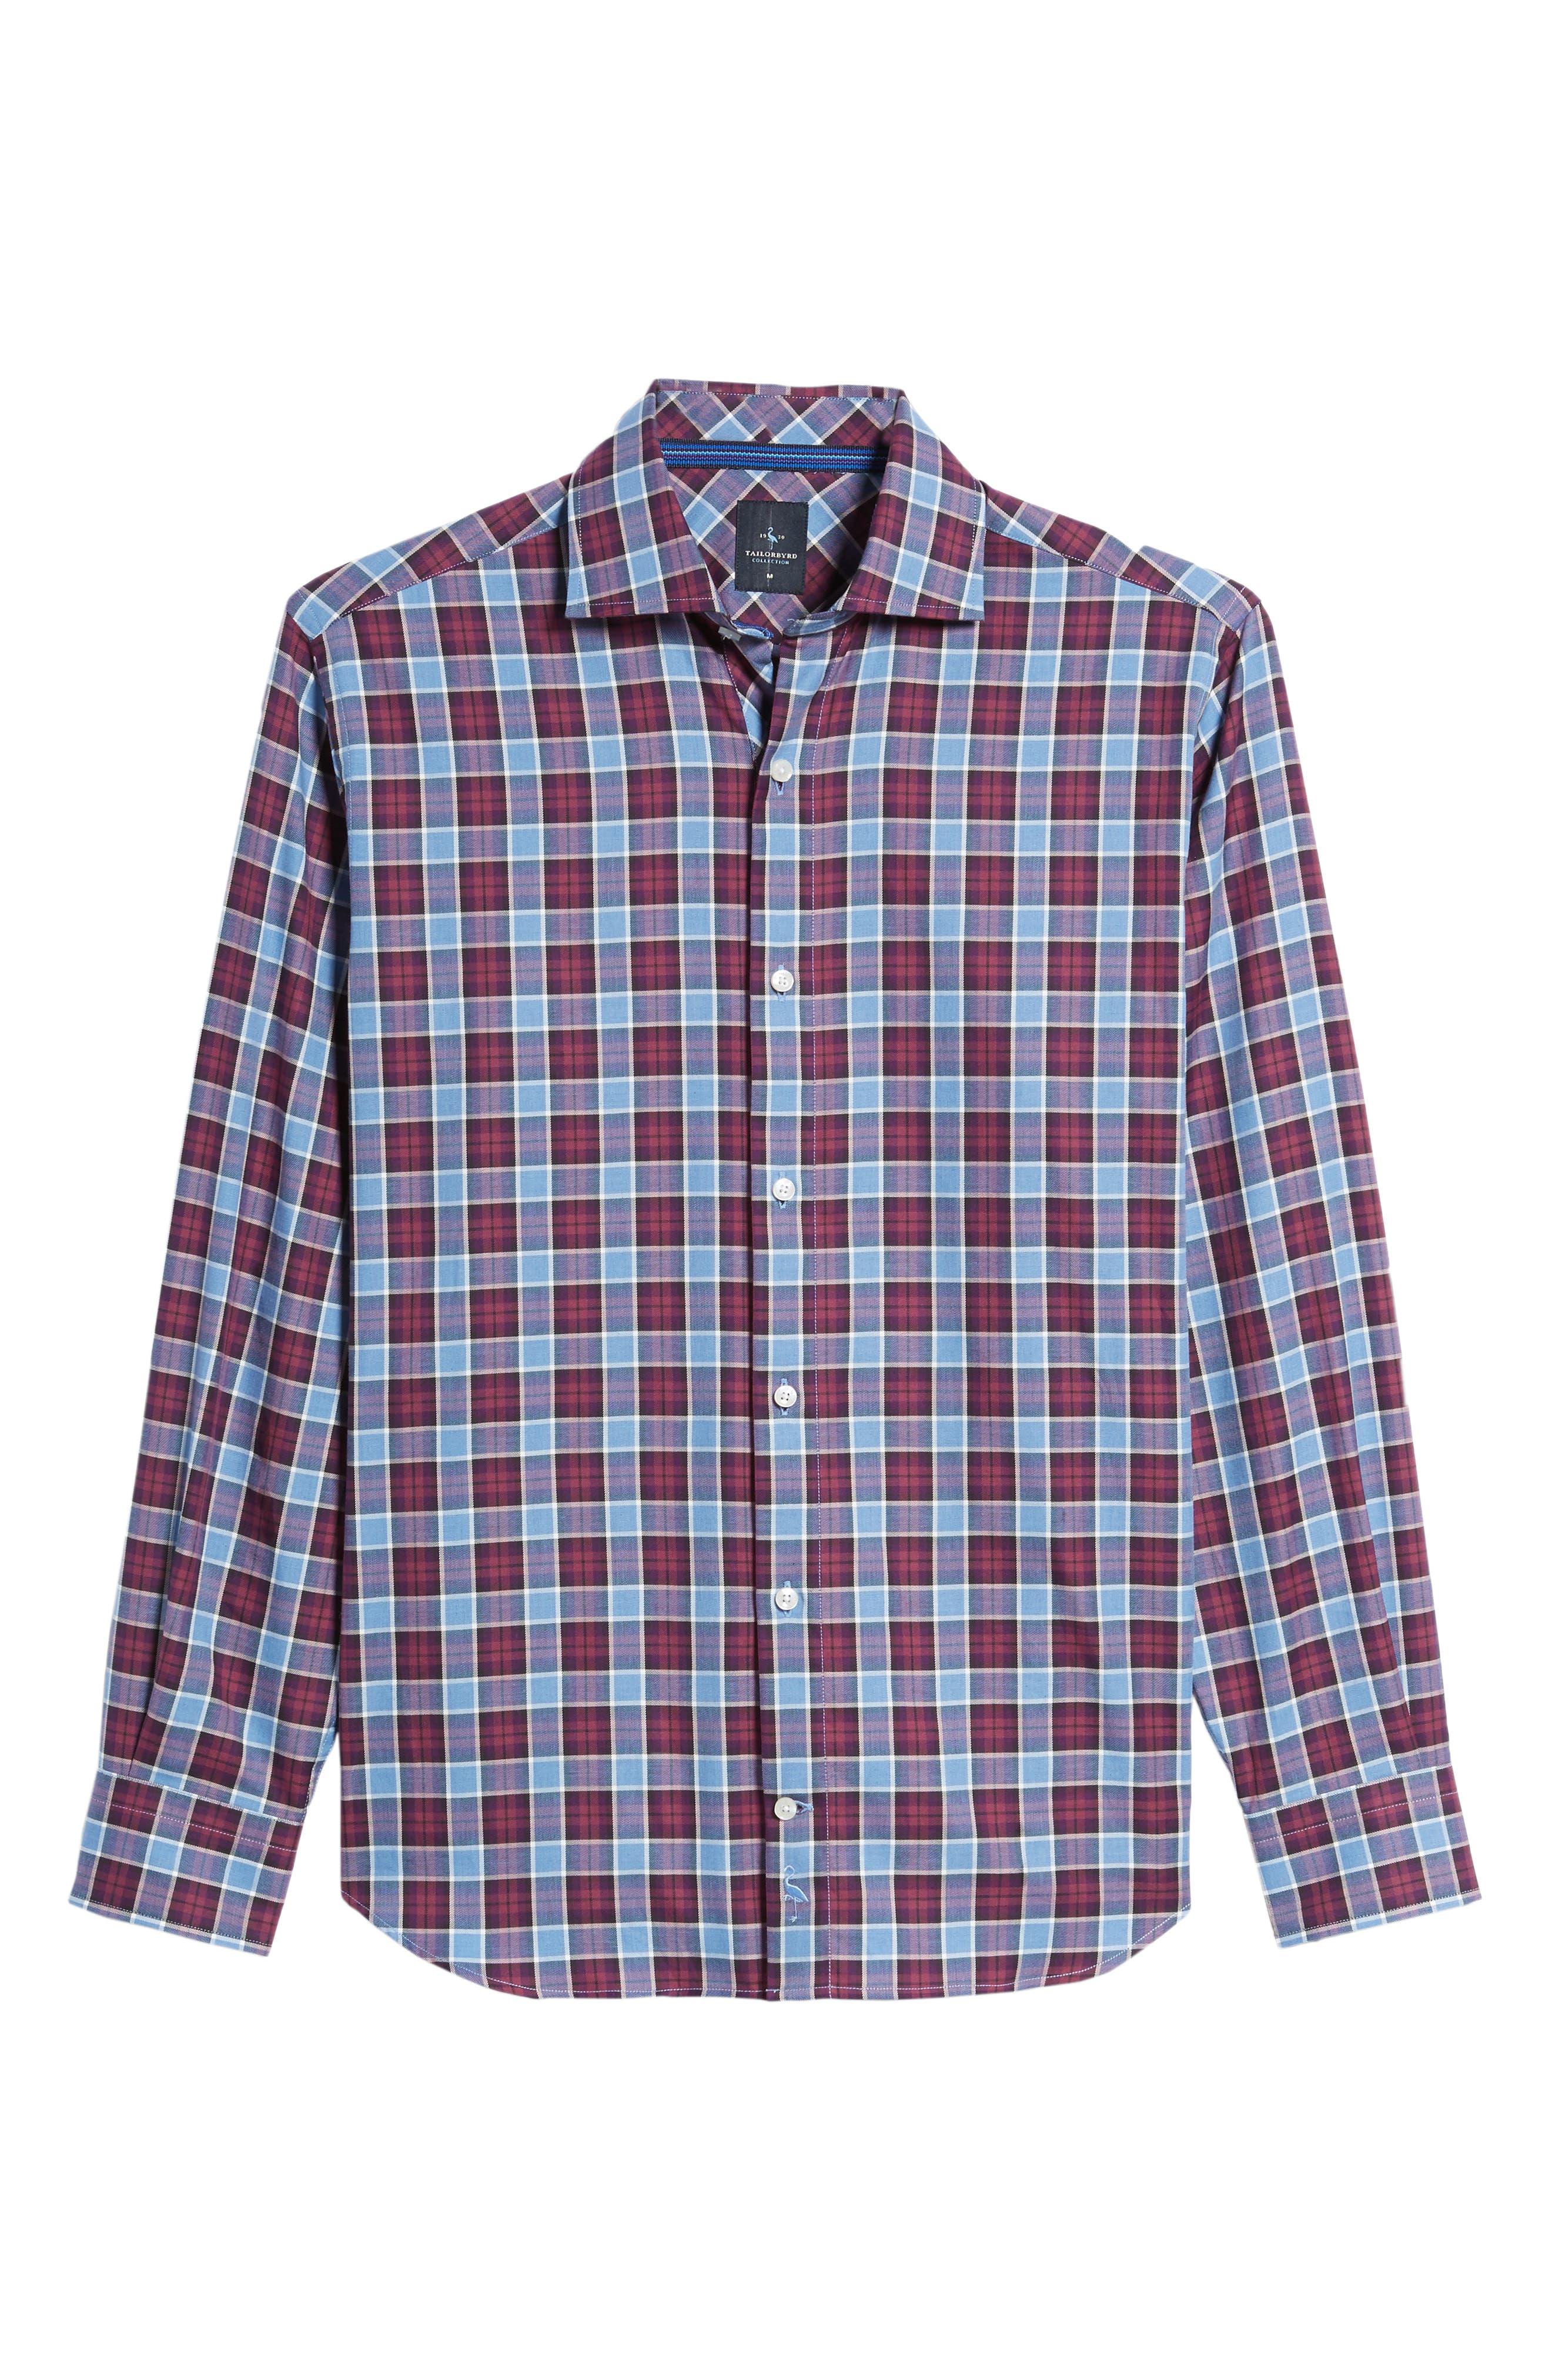 Campti Regular Fit Plaid Sport Shirt,                             Alternate thumbnail 6, color,                             Purple